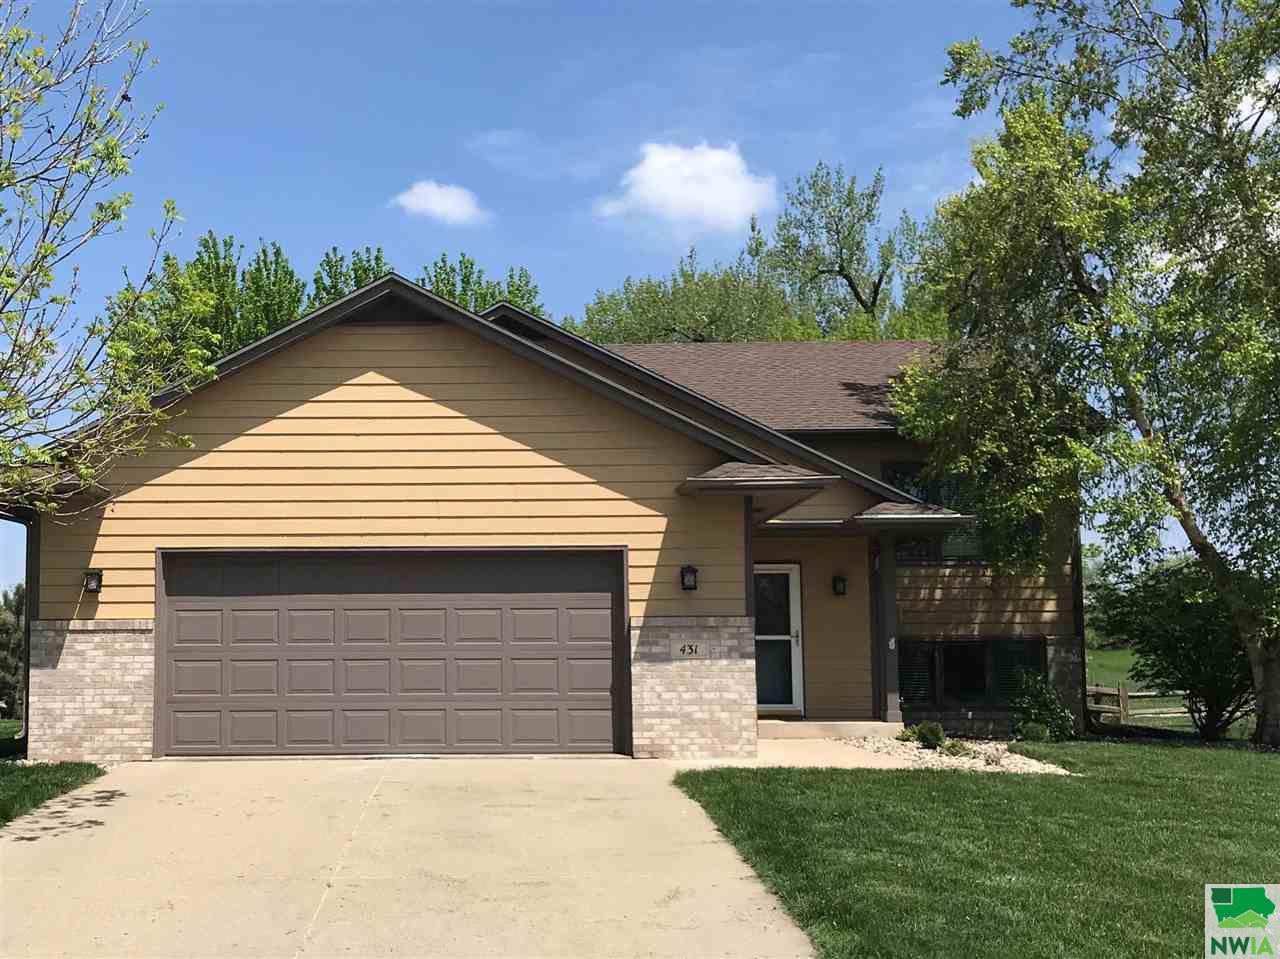 Property for sale at 431 Bison Trail, Dakota Dunes,  SD 57049